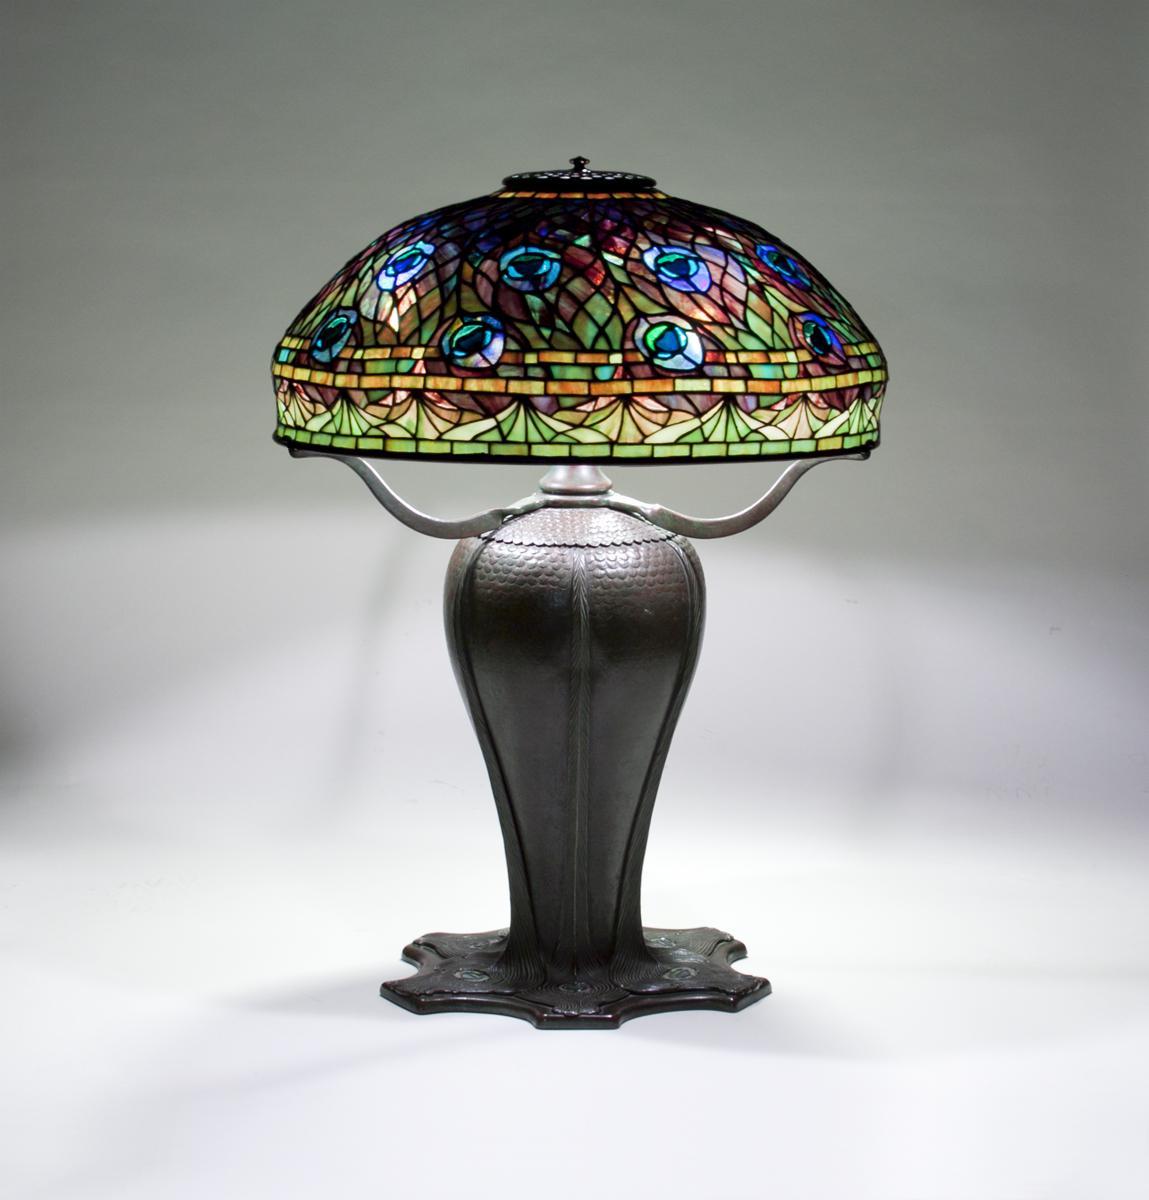 Tiffany Studios  Rare Peacock Table Lamp 1